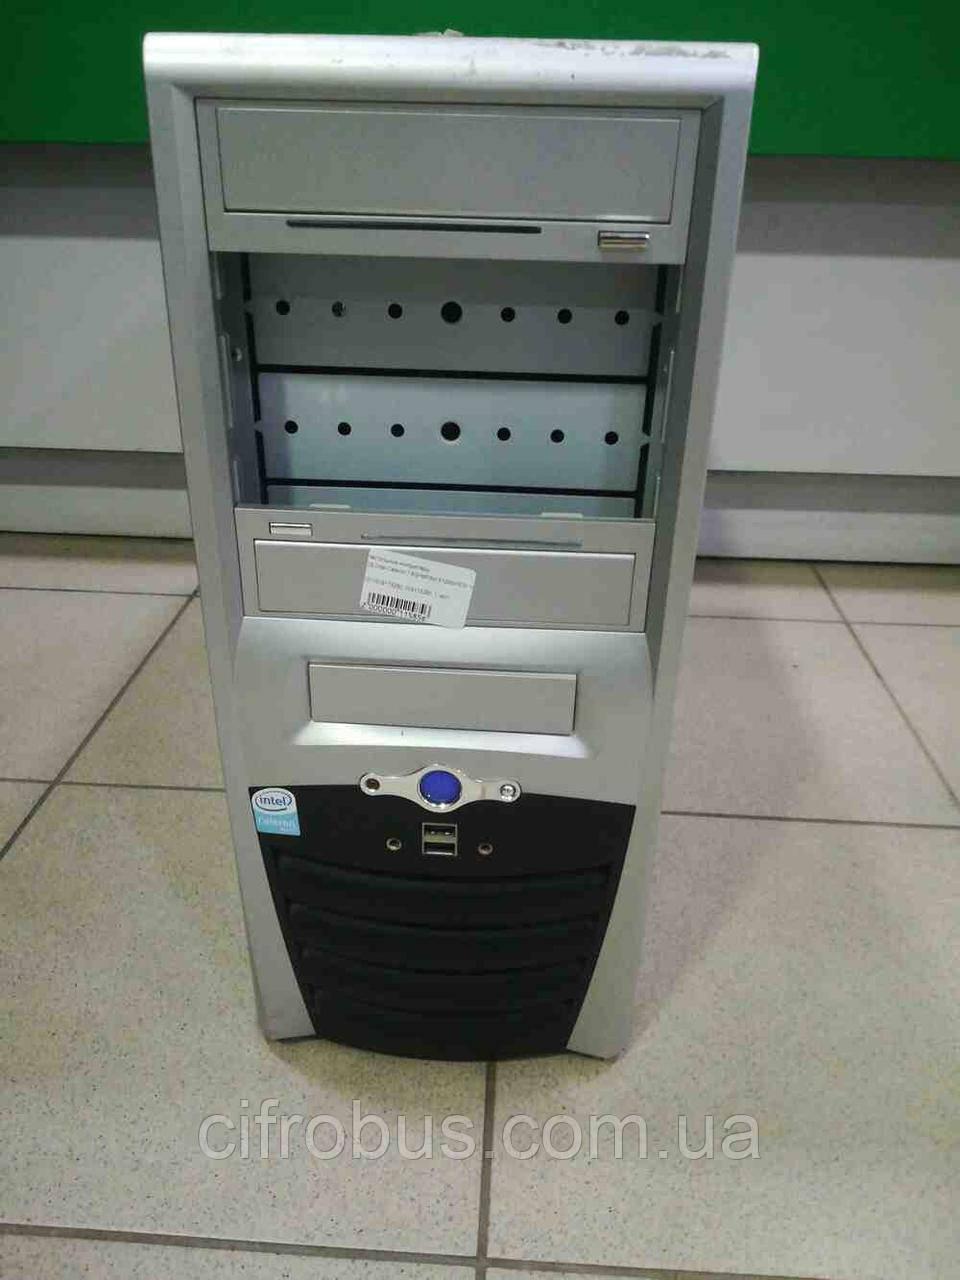 Б/У СБ (Intel Celeron 1.6GHz/RAM 512Mb/HDD 160Gb/Vid 64Mb)